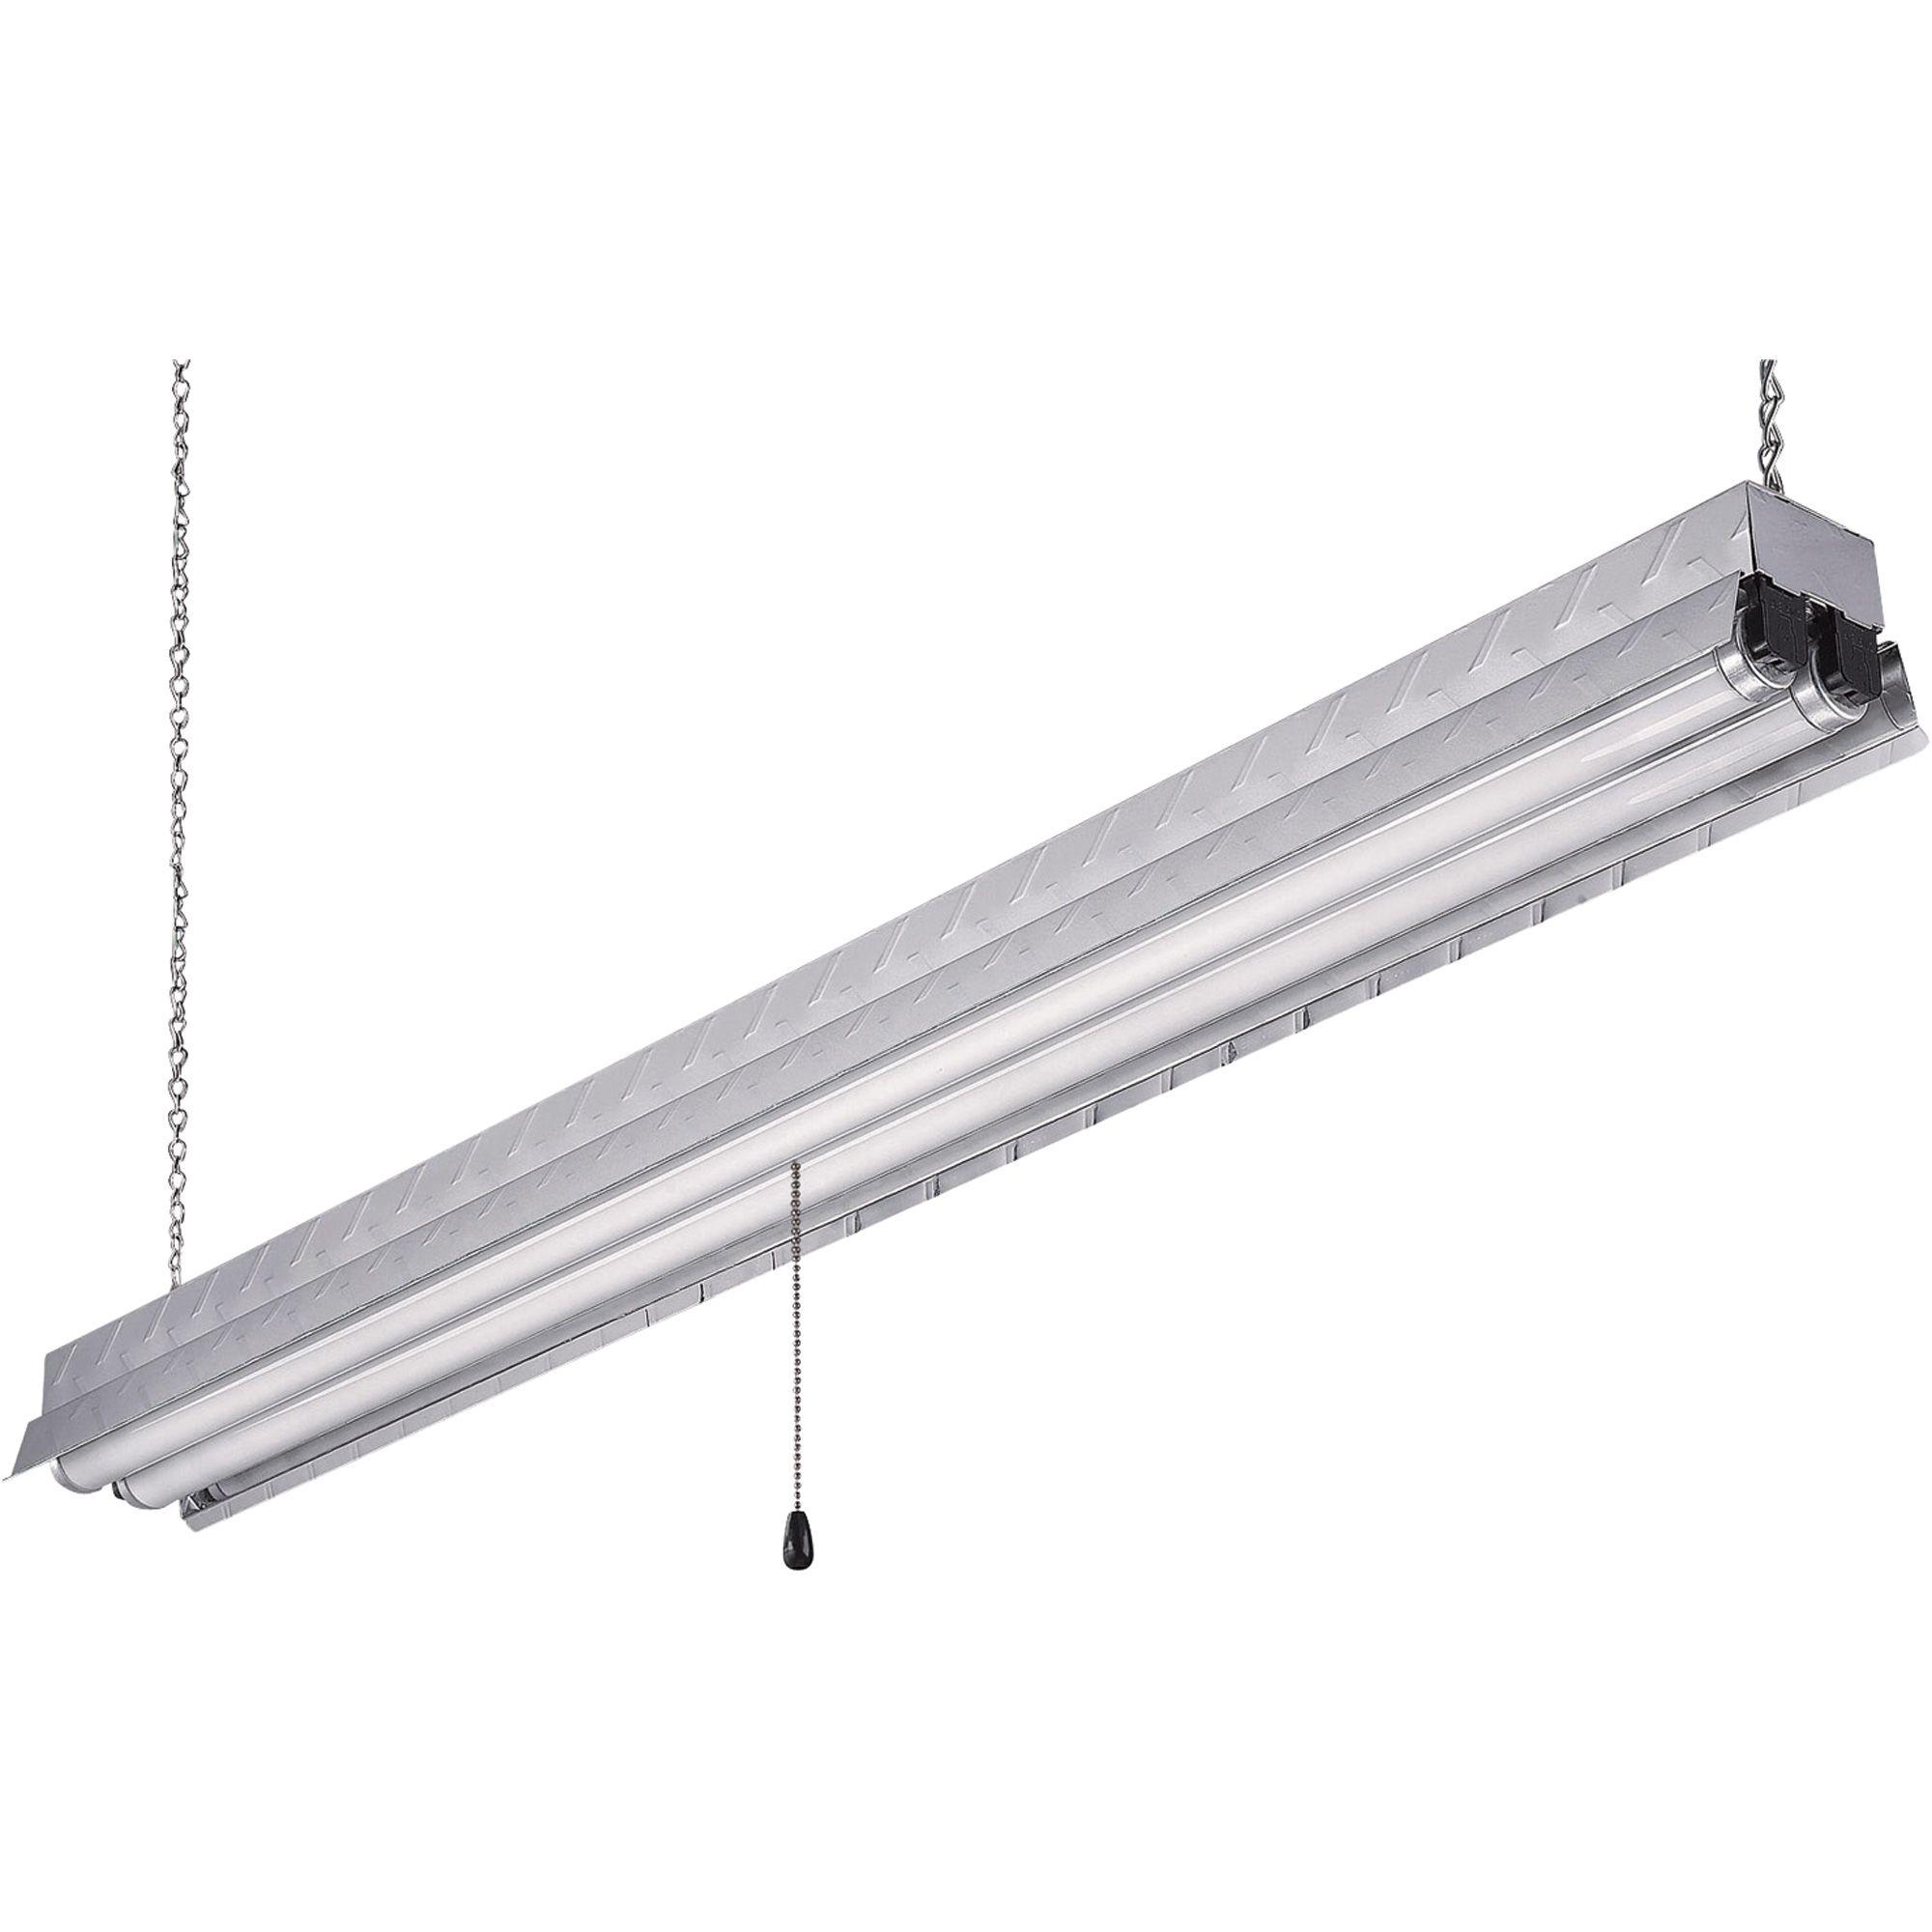 Canarm Hanging Metal Shop Light 48 In Model Efs848232al